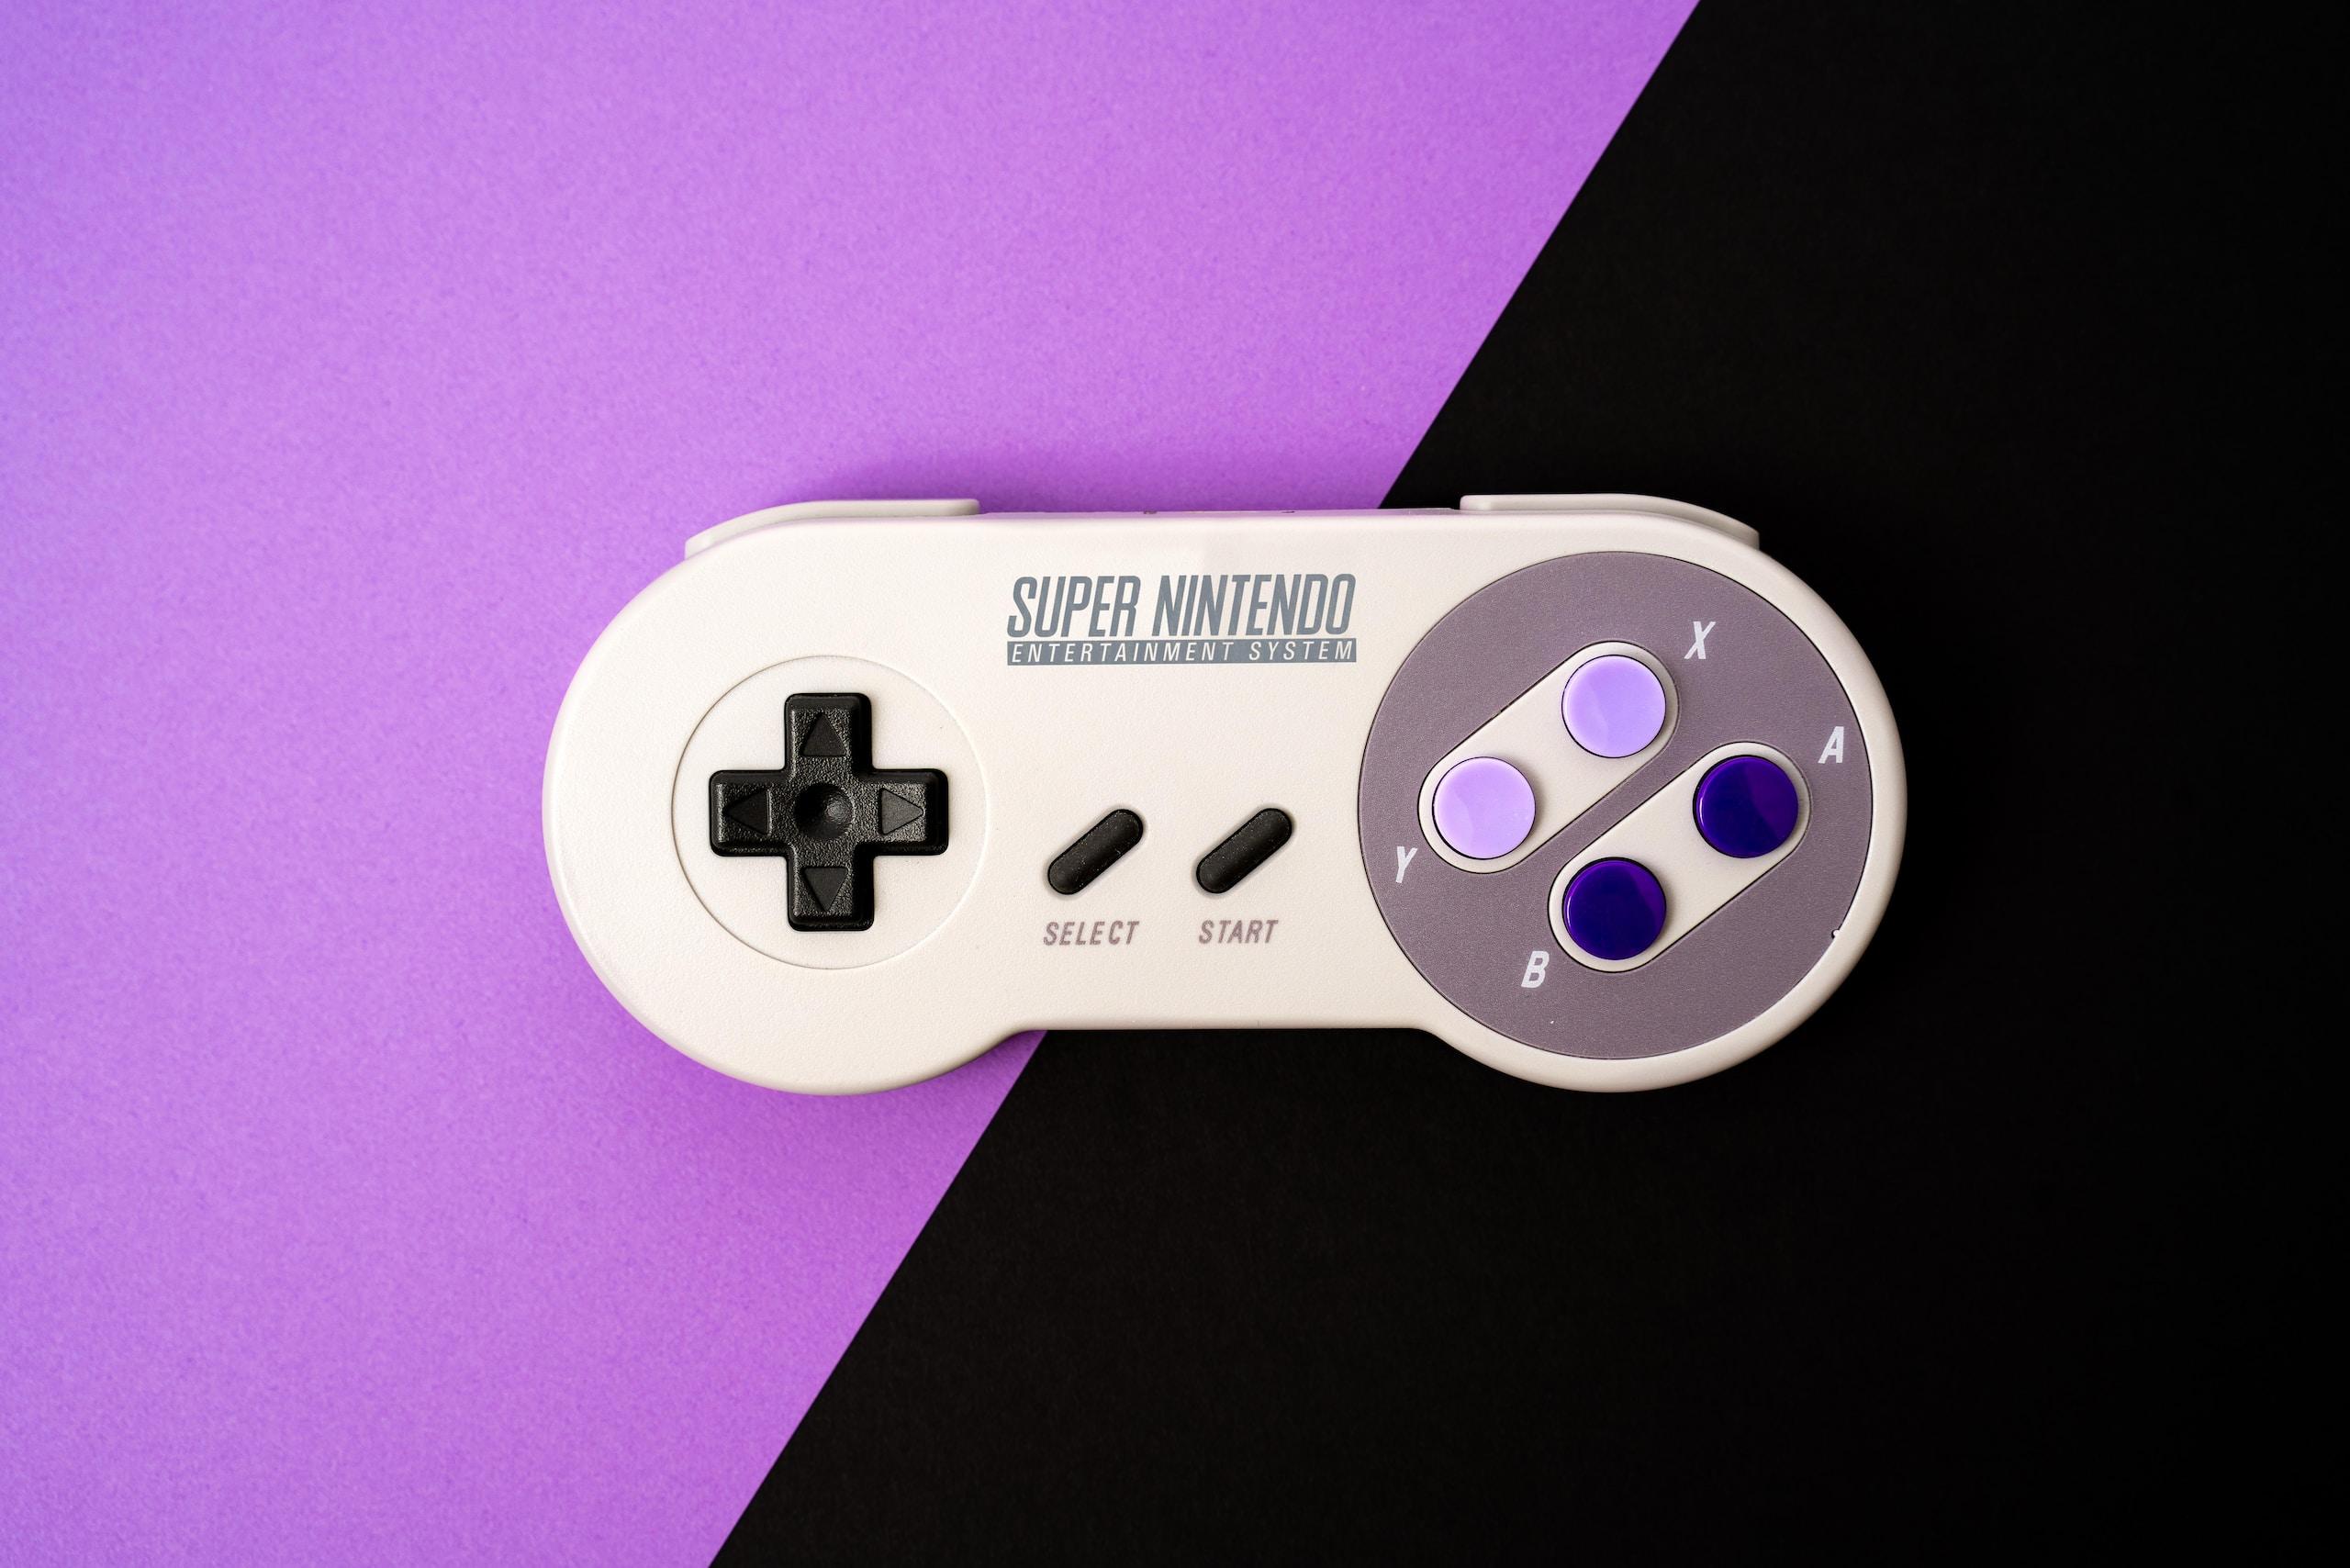 NES / Super Nintendo / Nintendo / Lance Barr / Nintendo Entertainment System